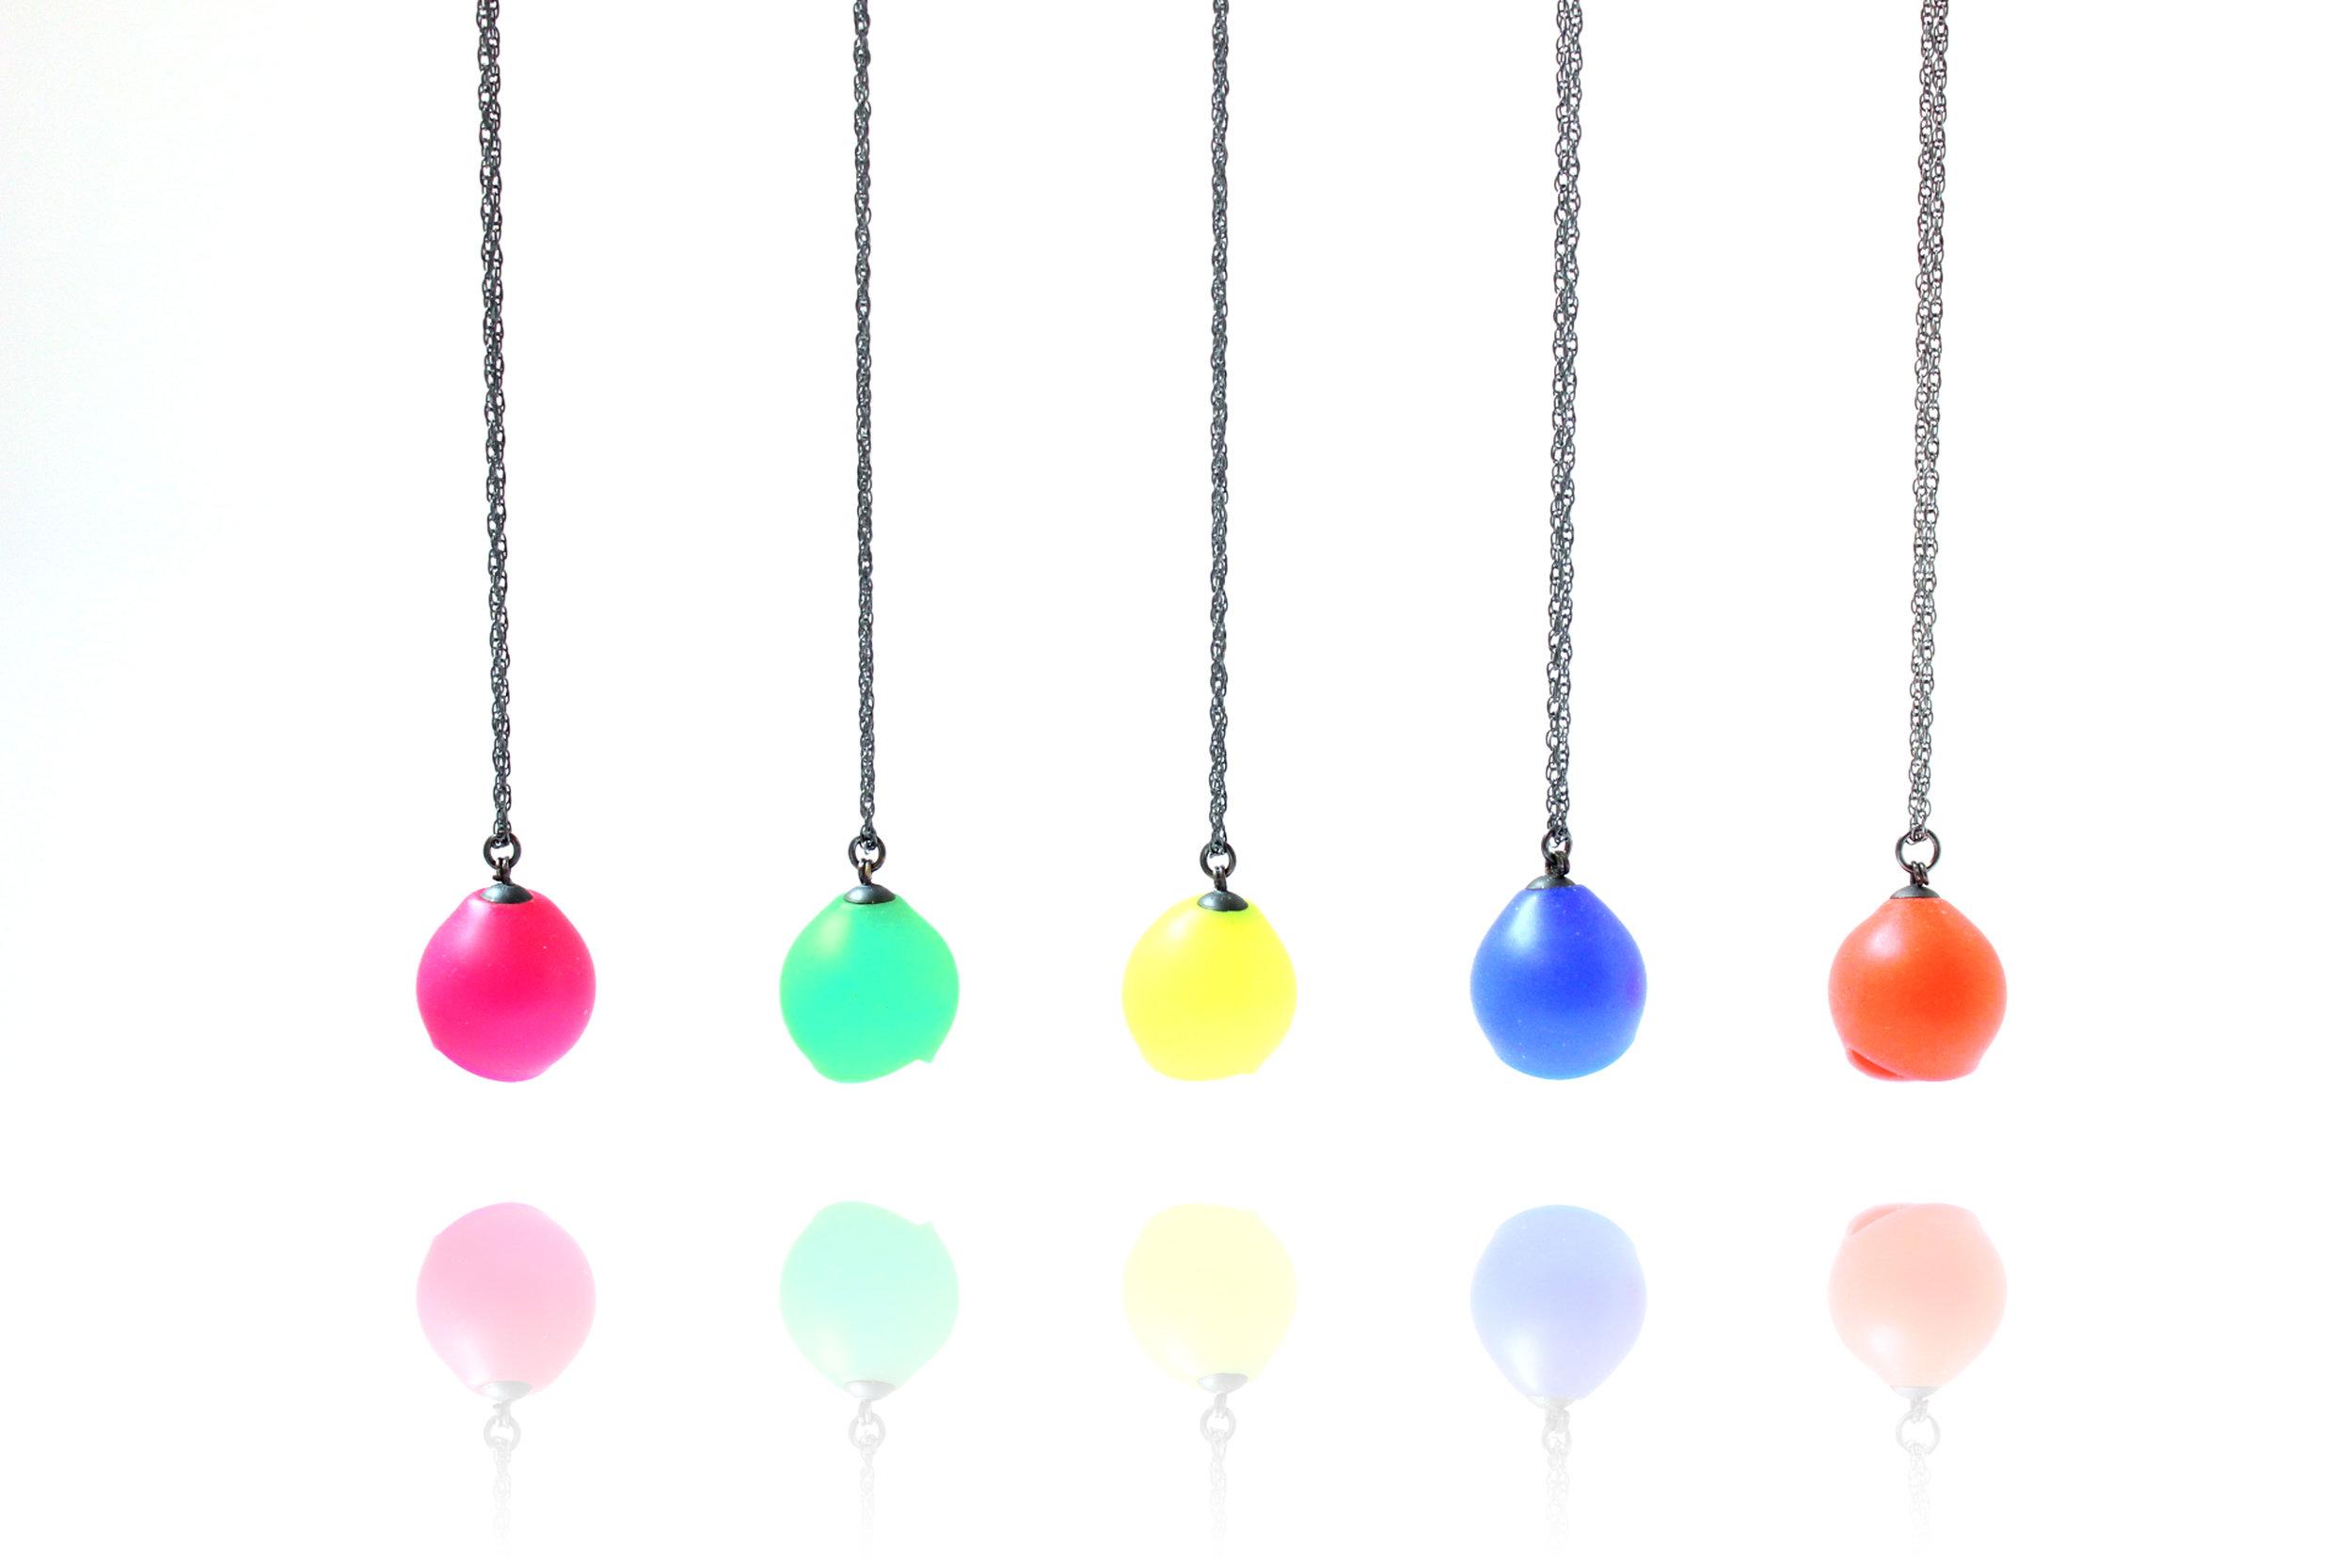 5 Jenny Llewellyn-Mix Up Look Sharp 1 cup pendants-300.jpg